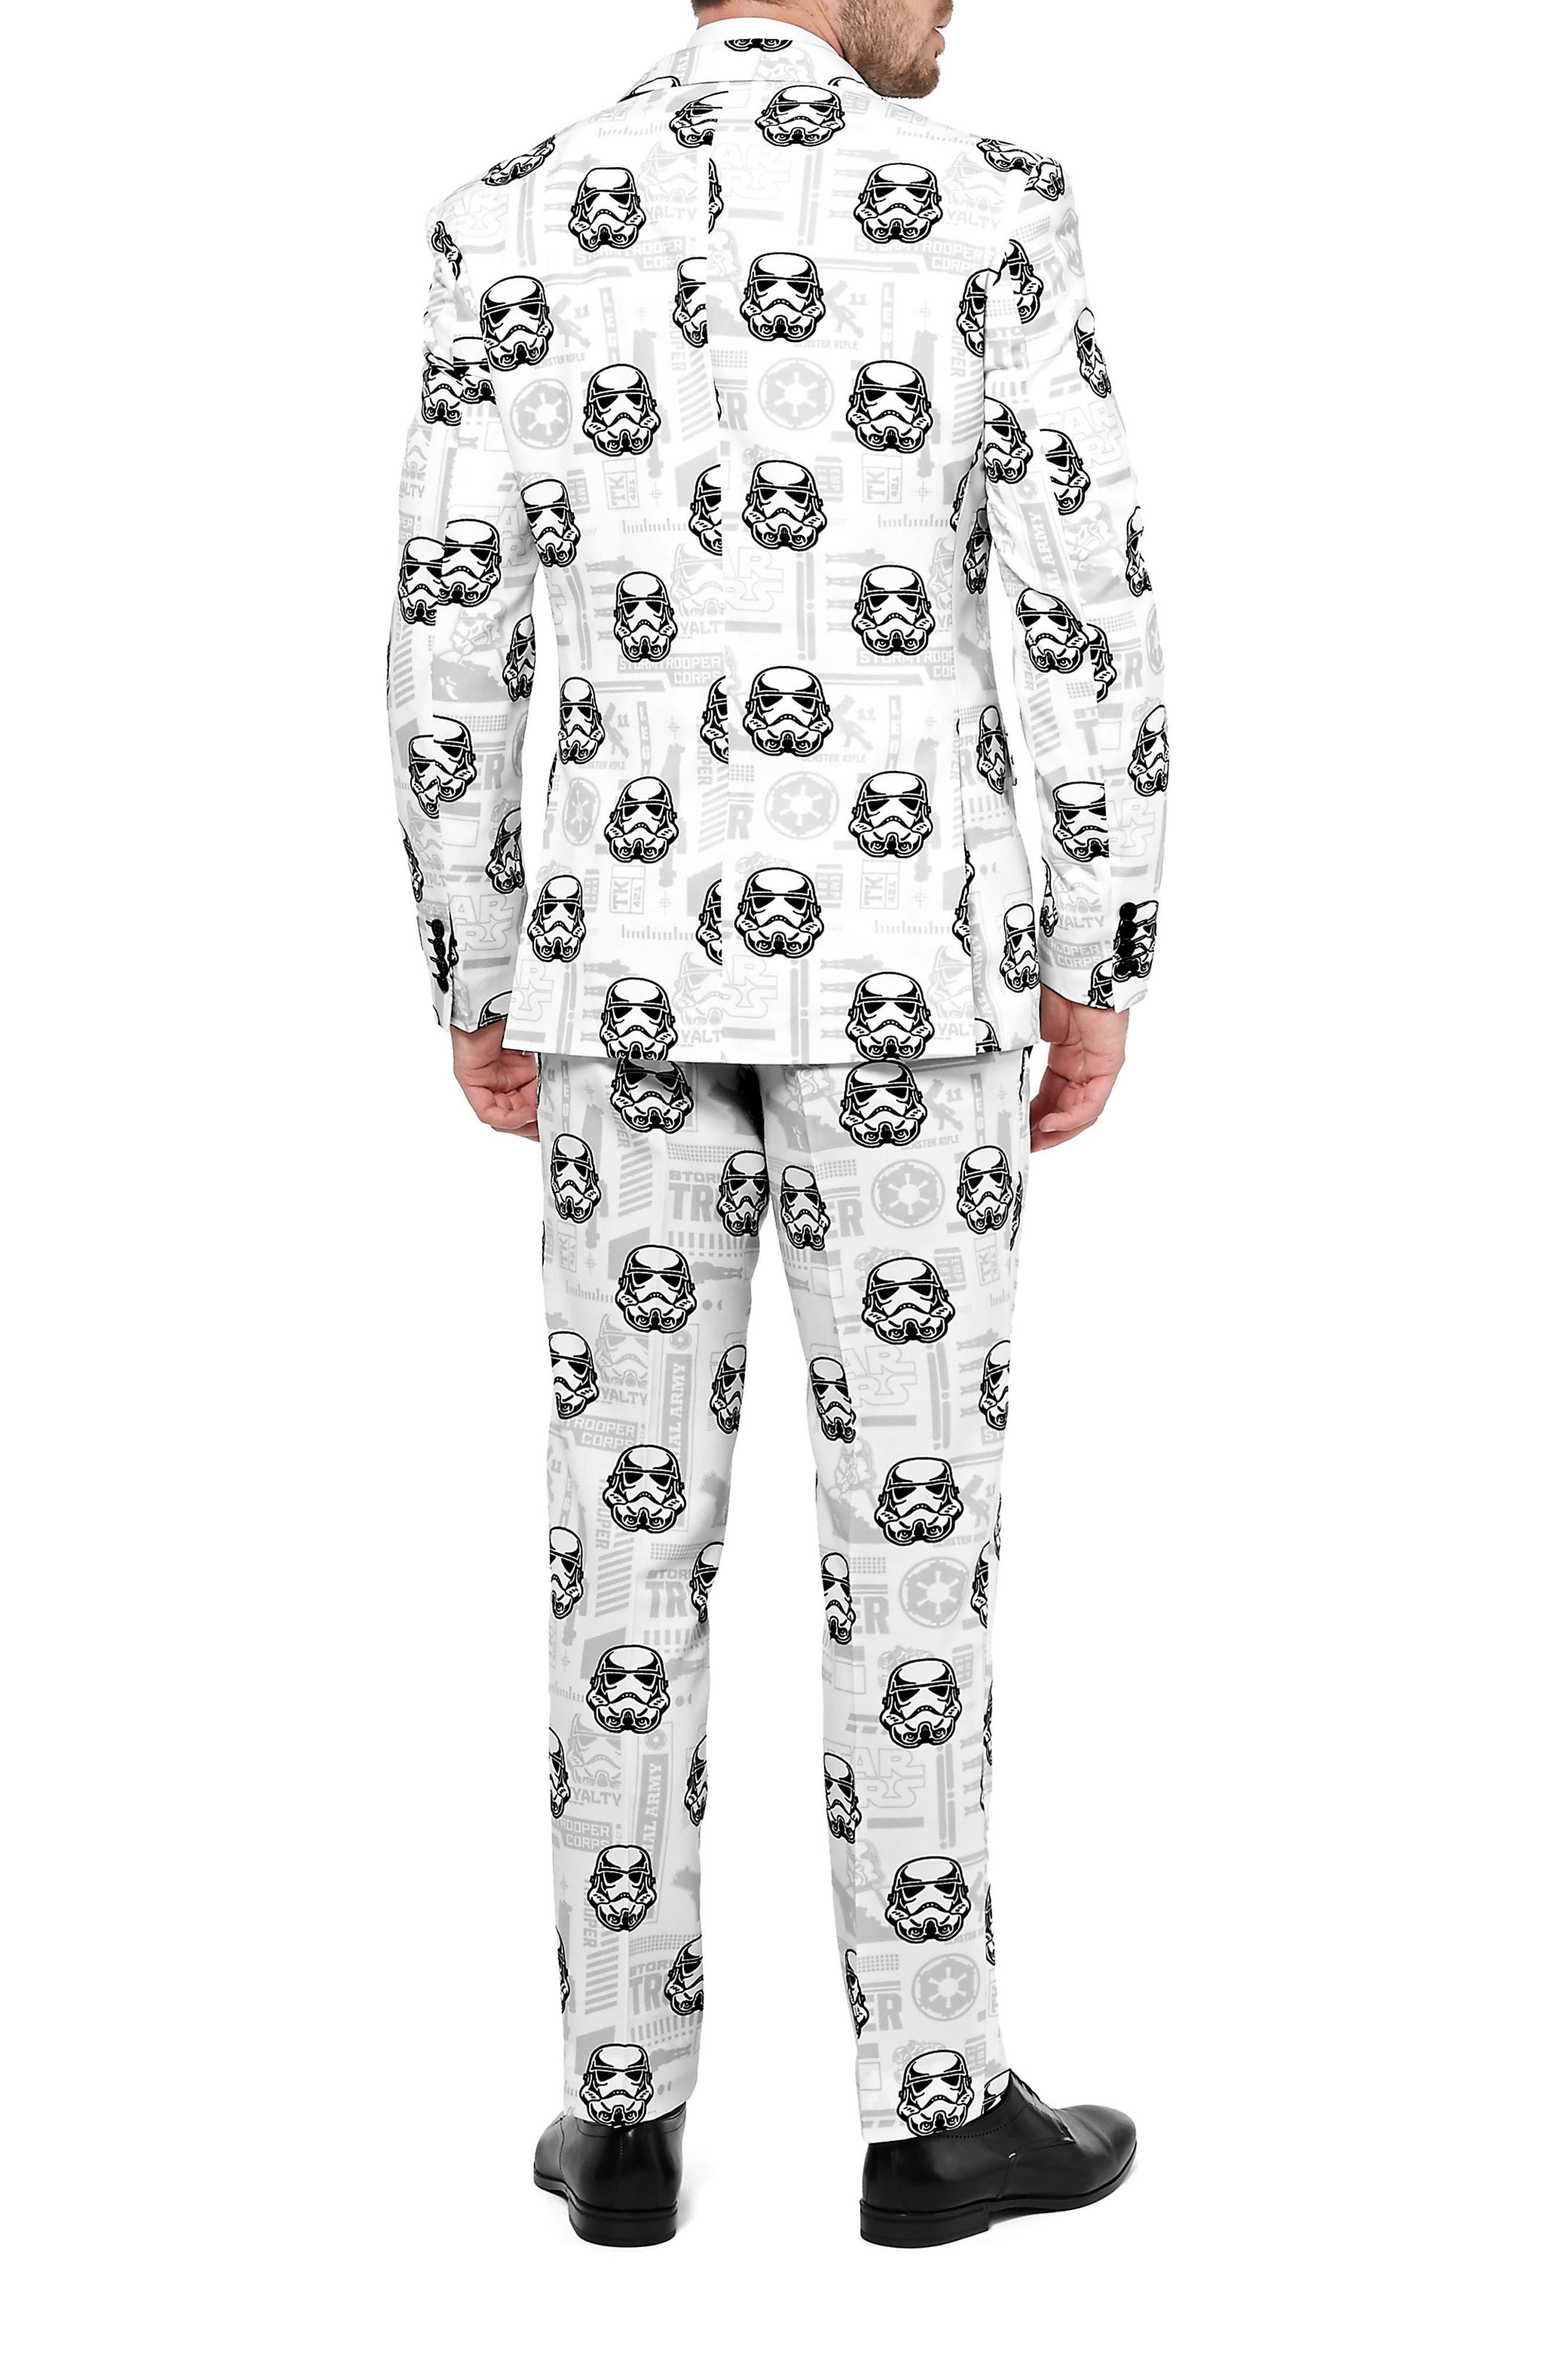 Stormtrooper Trim Fit Two-Piece Suit with Tie,                             Alternate thumbnail 2, color,